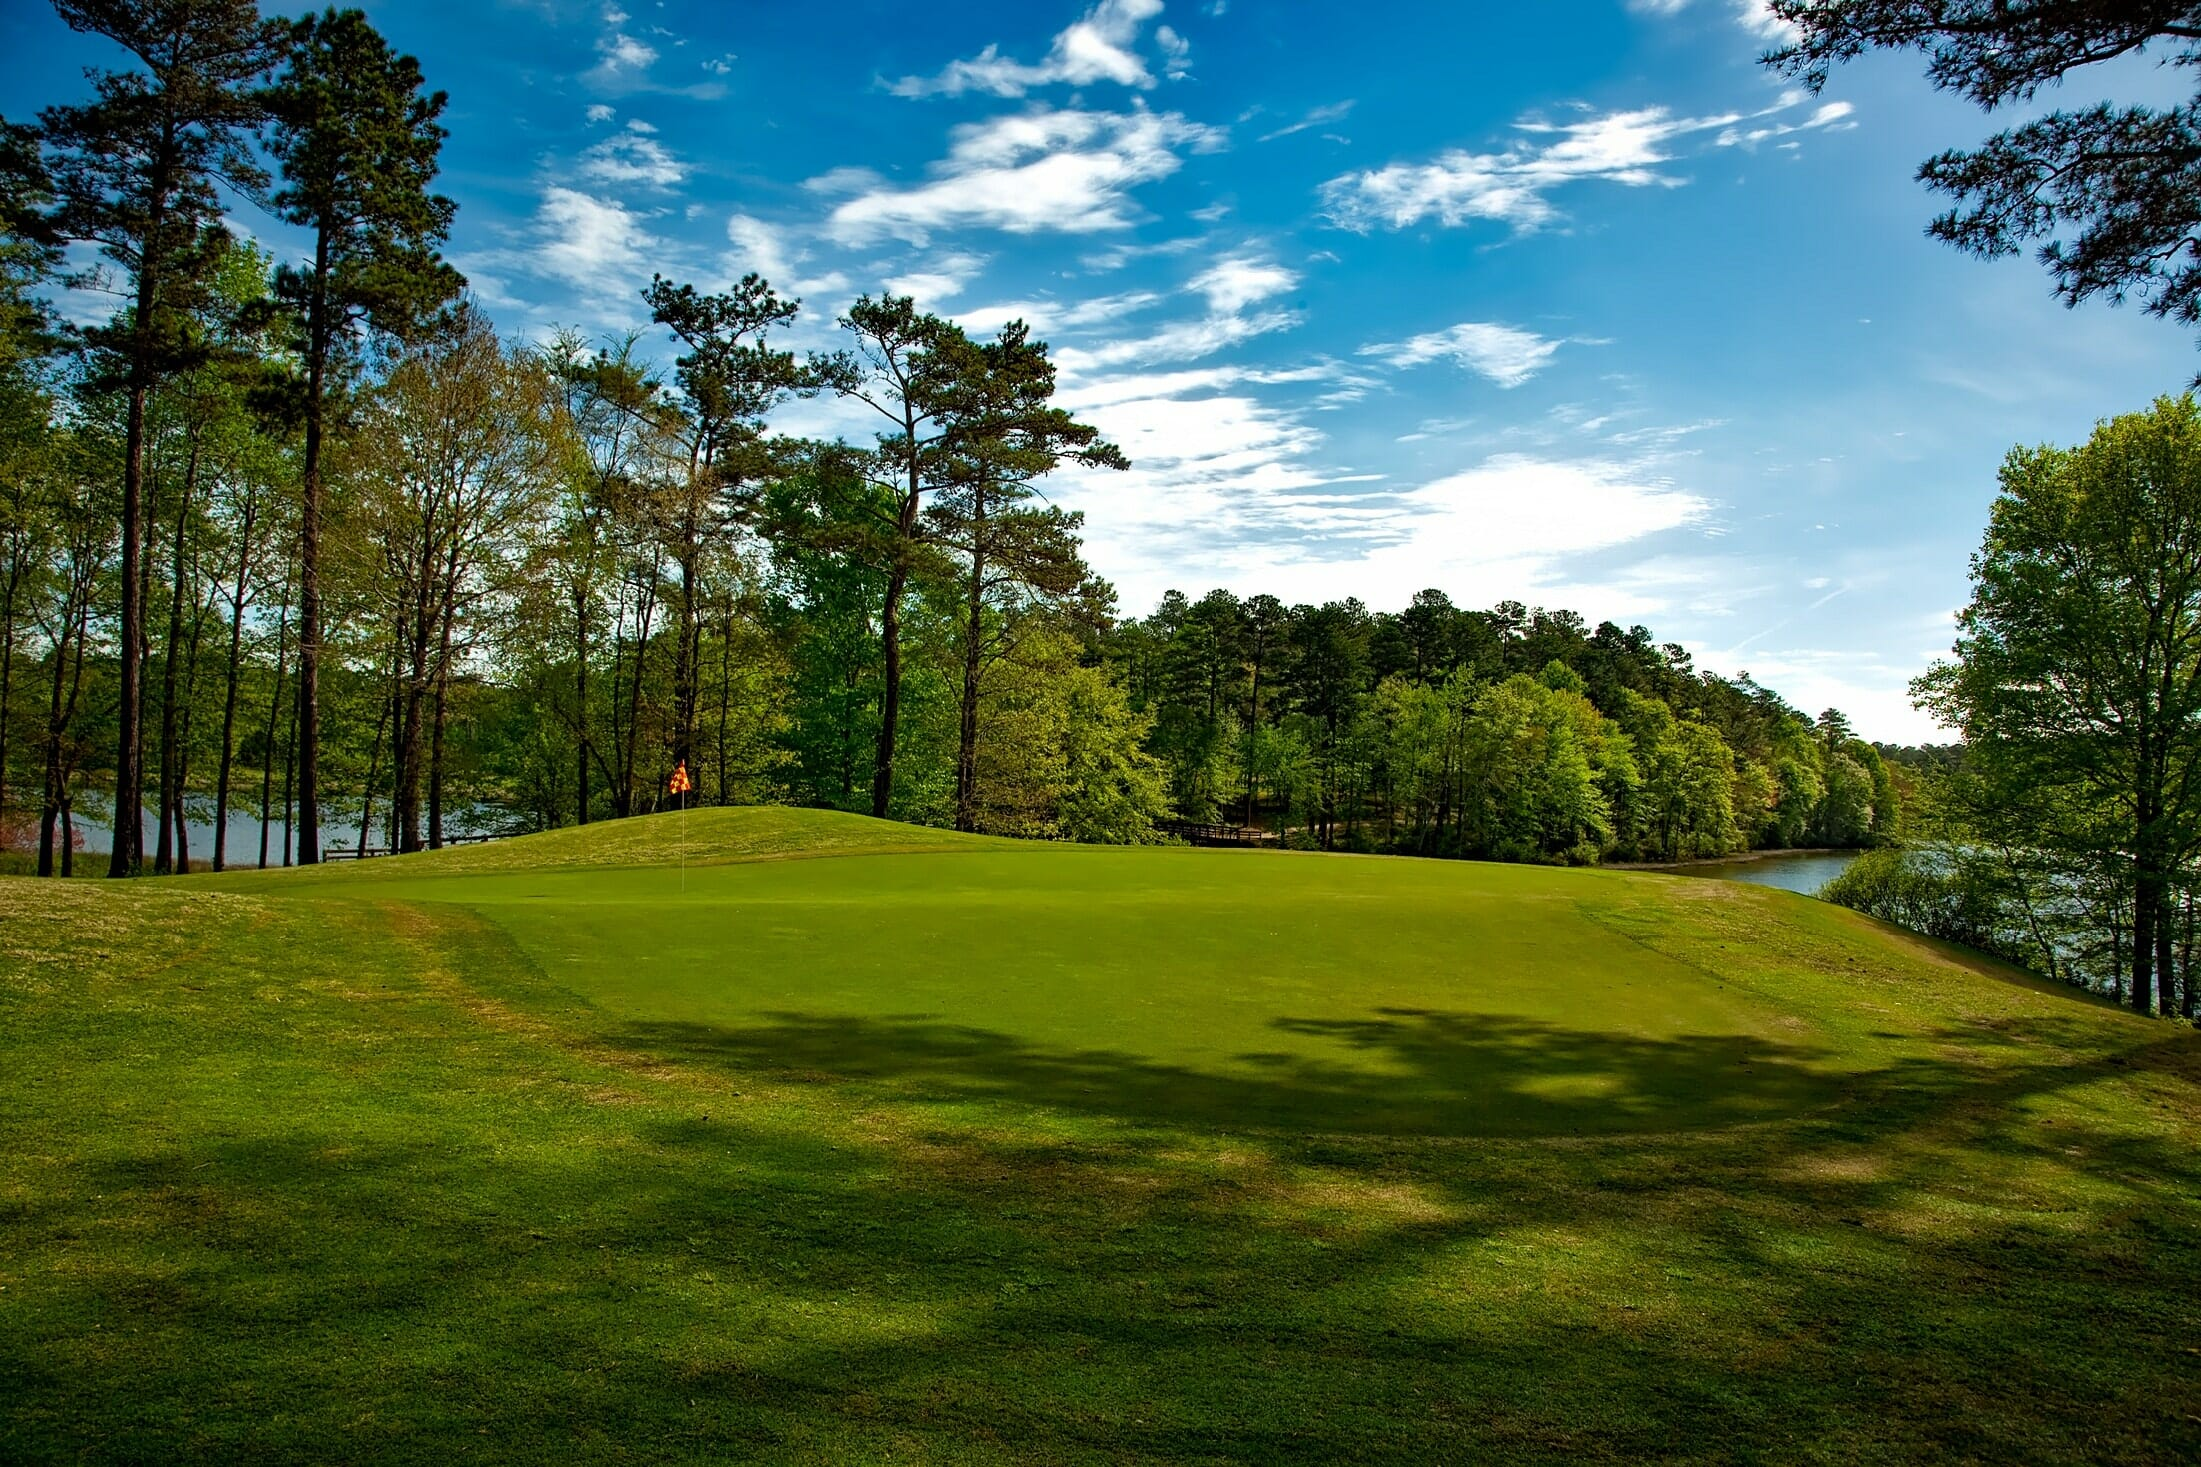 benefits of a golf rangefinder with slope